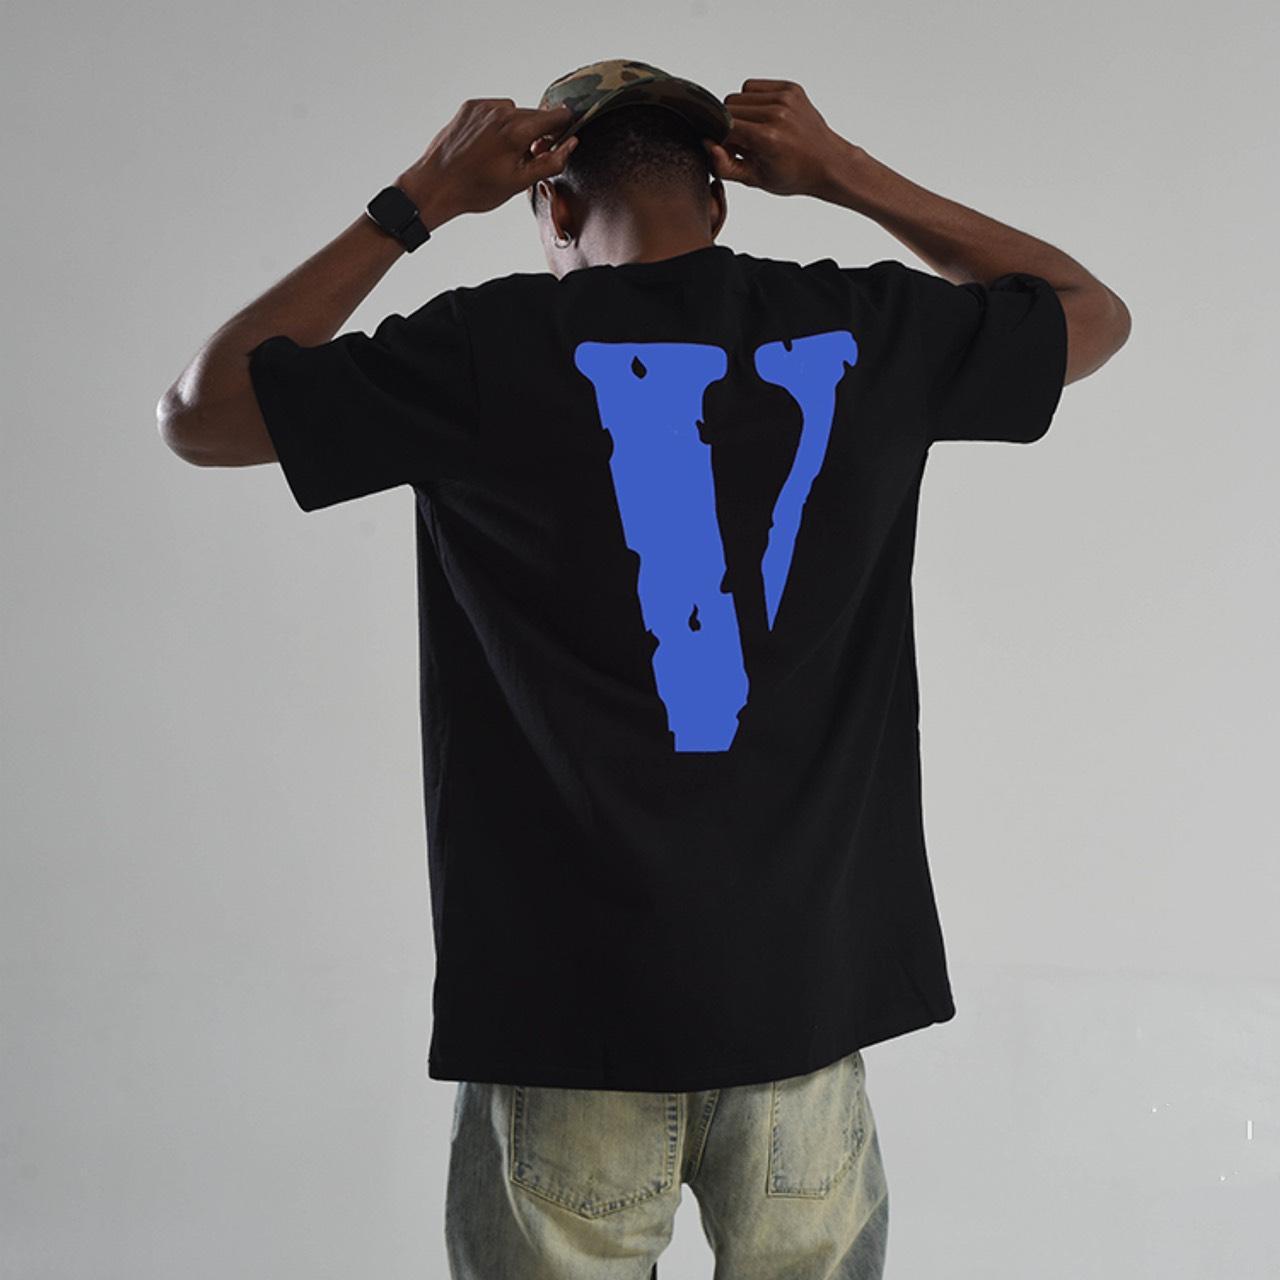 【MF SHOP】VLONE ICON S/S TEE 短袖T恤